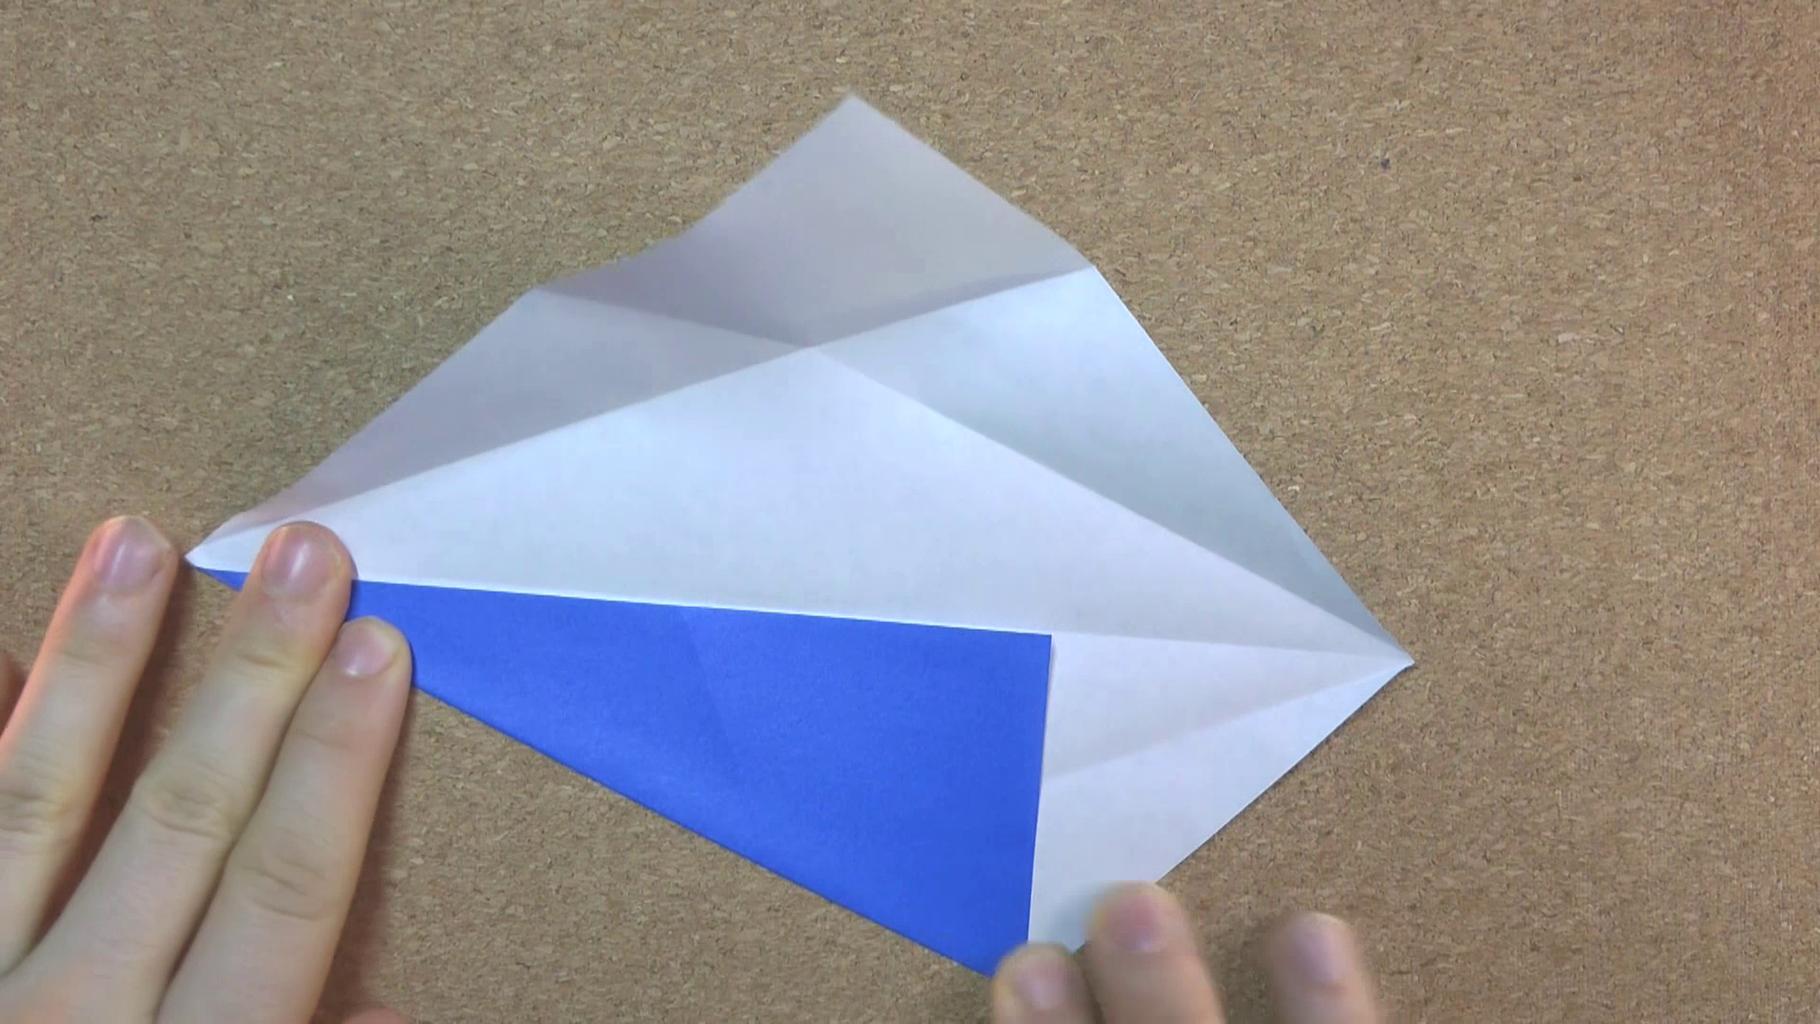 Fold and Unfold Kite Shape Again